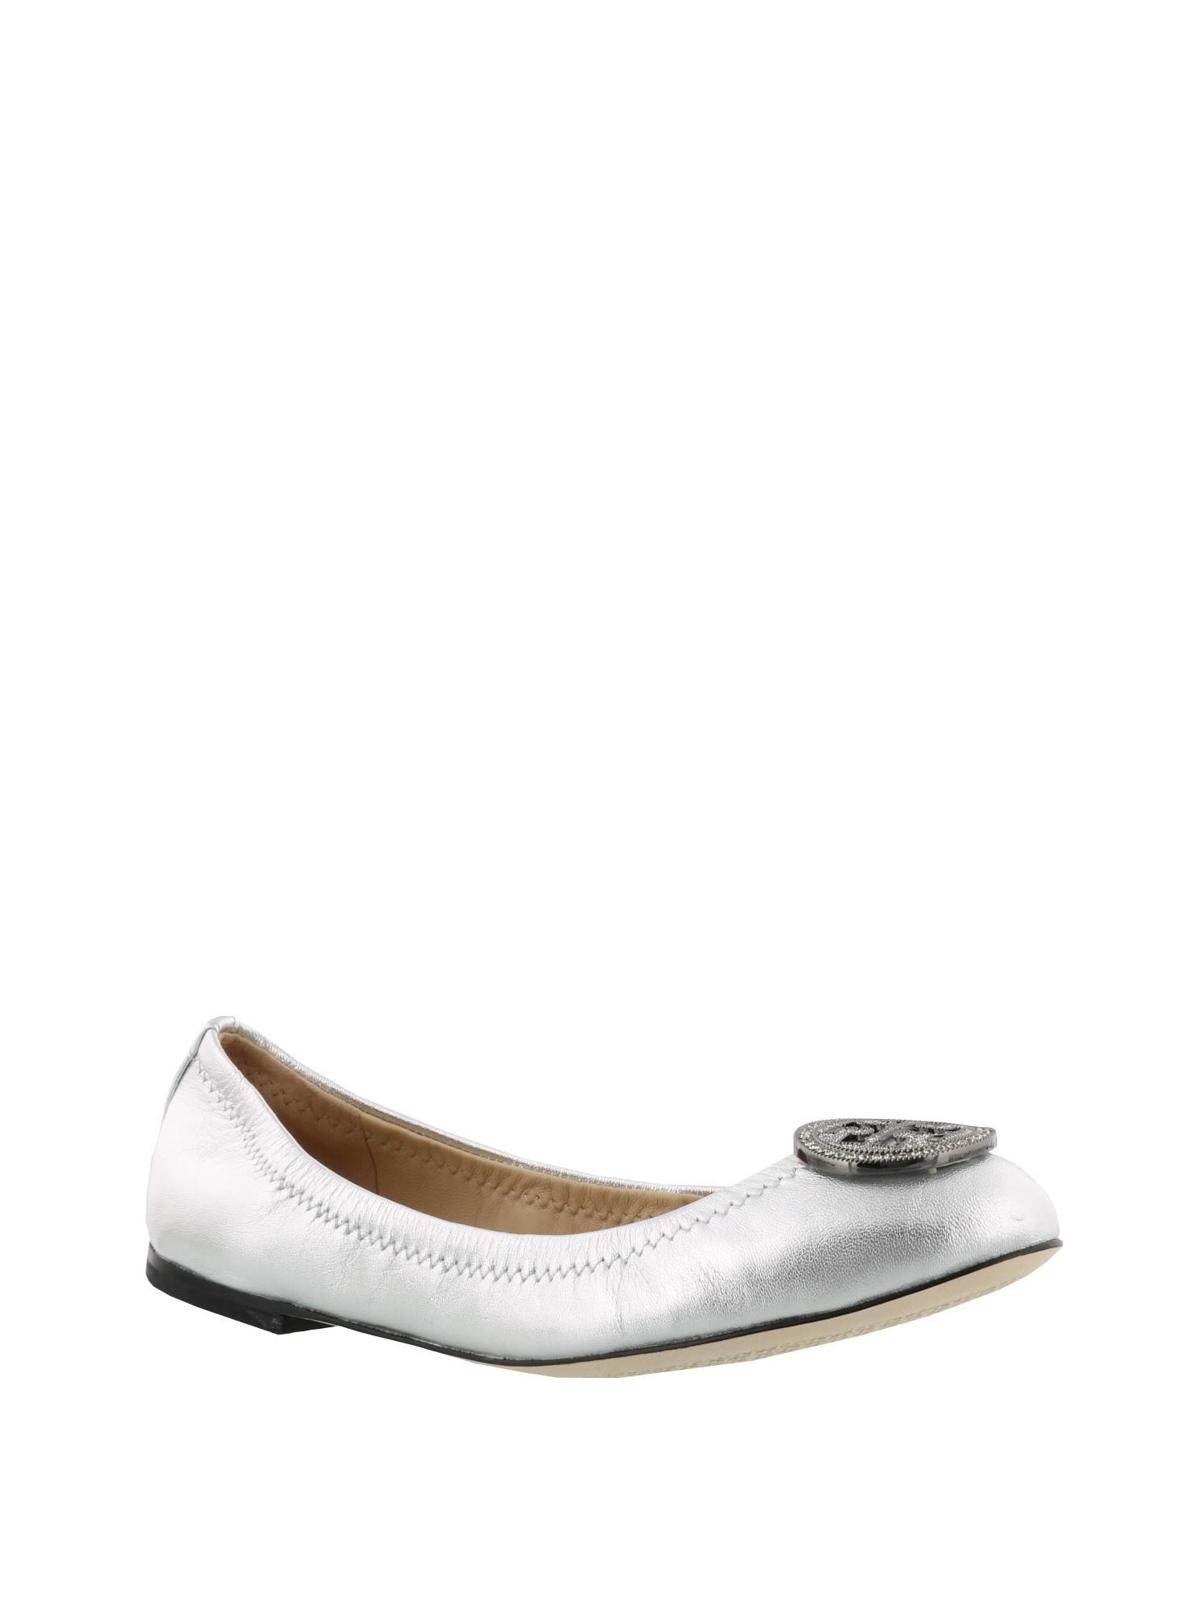 Liana silver flat shoes by Tory Burch - flat shoes | iKRIX